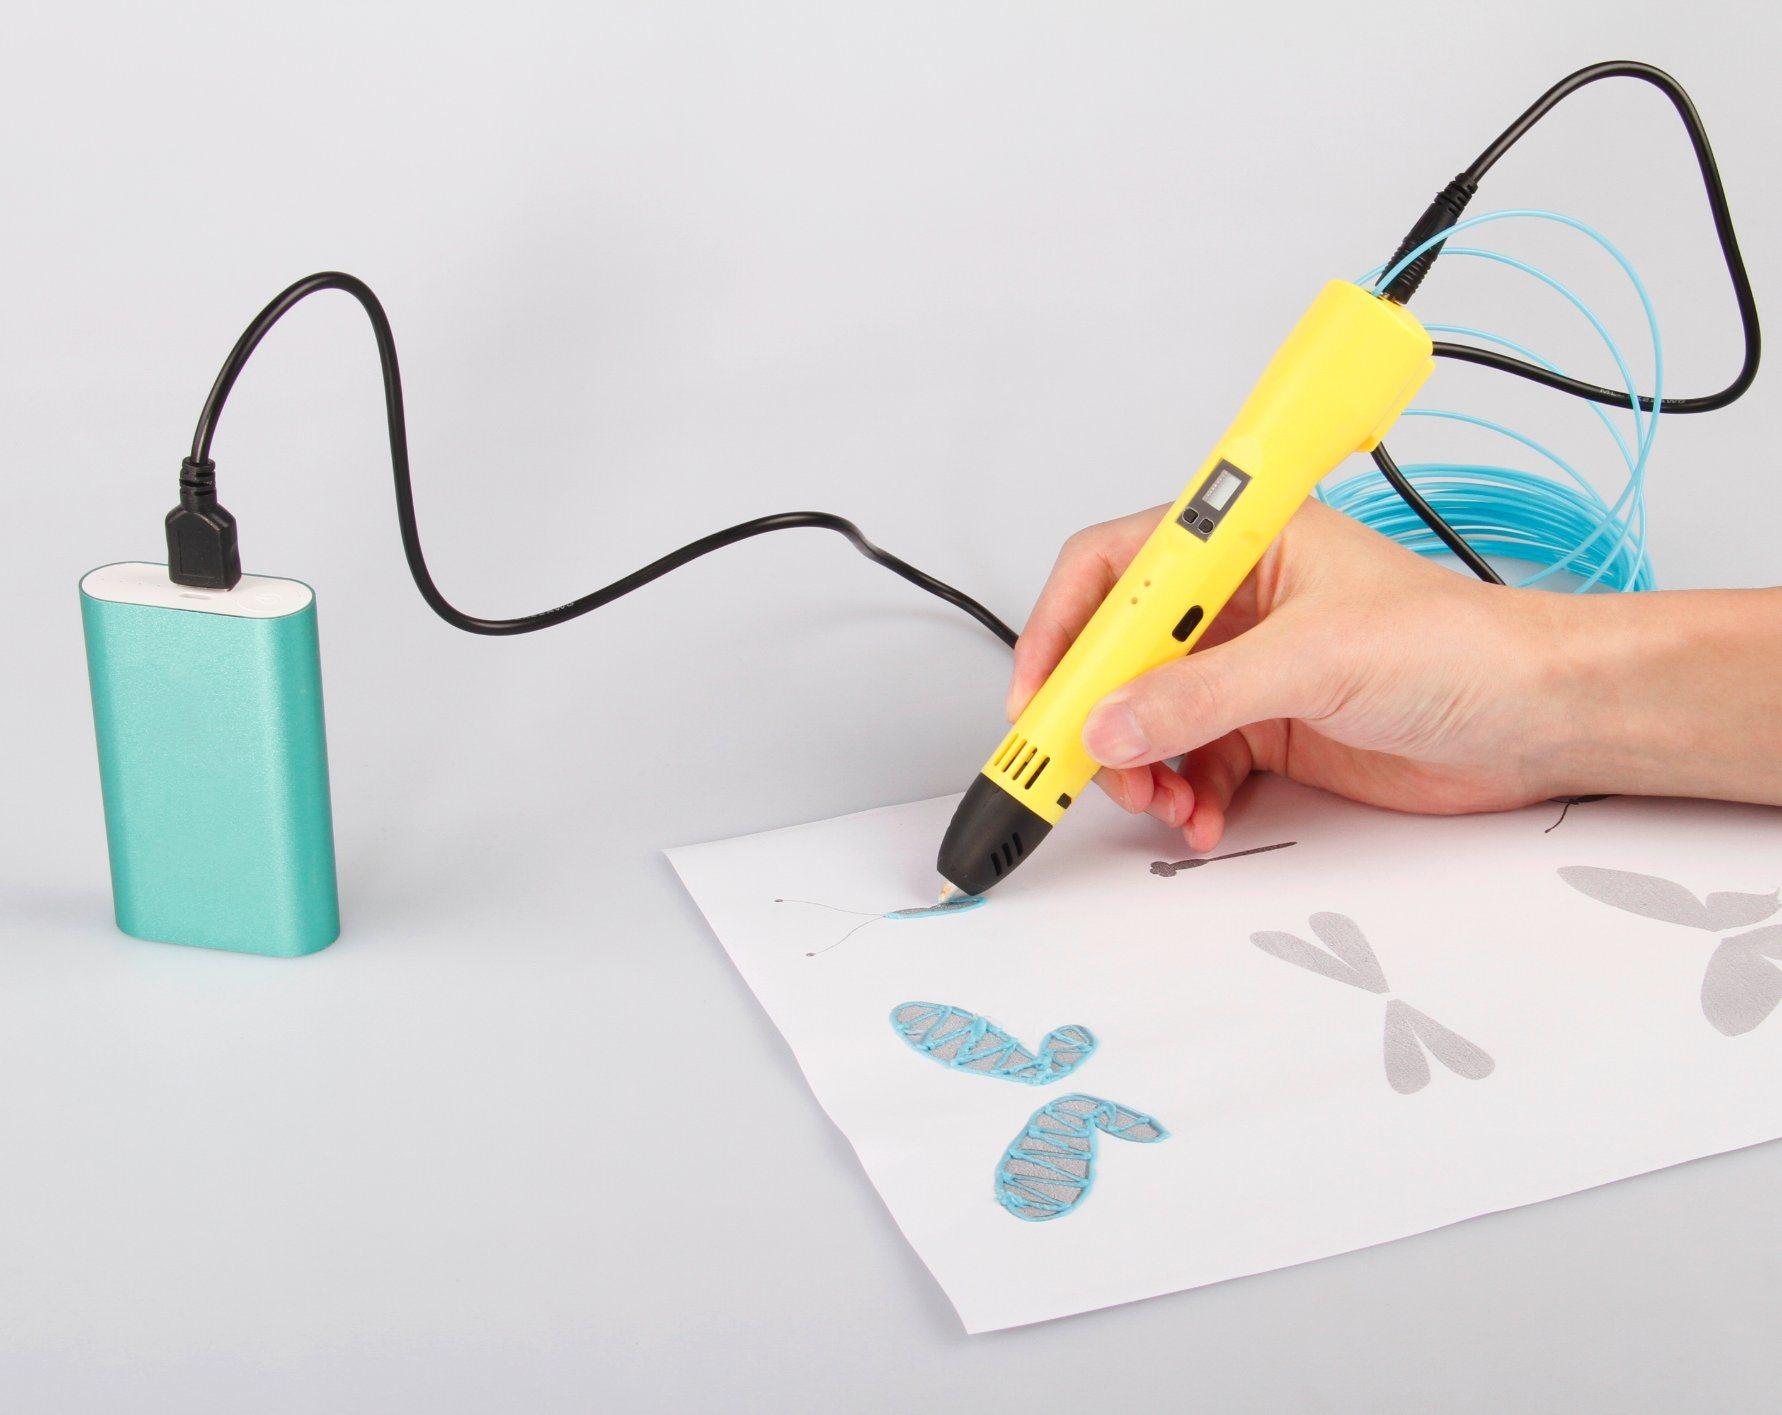 2016 Newest DIY Drawing Printing 3D Pens USB Port New Arrival 3D Printer Pen for Children